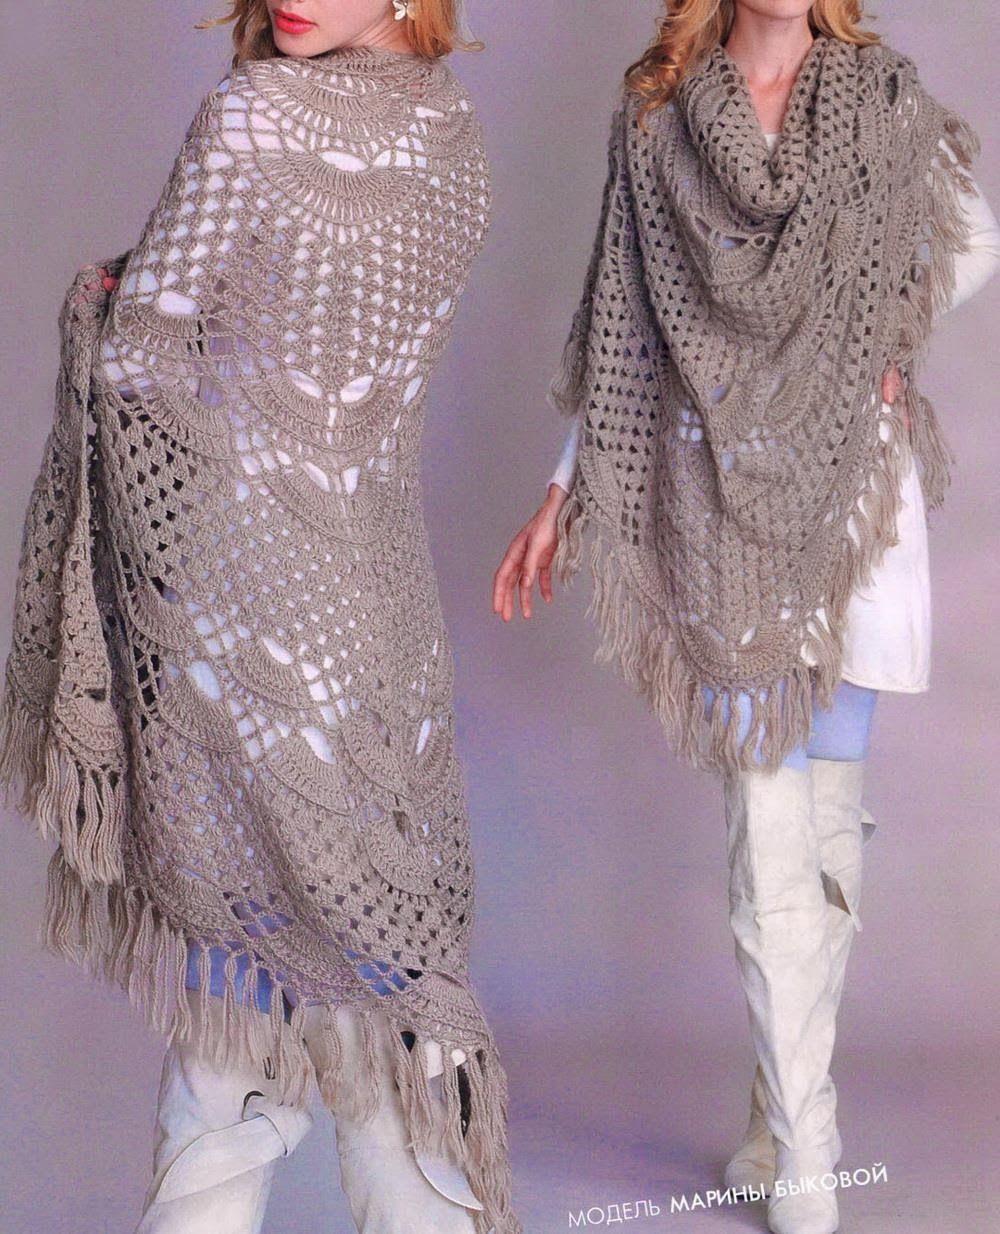 Crochet Shawl Pattern Wonderful Shawl For Chic Women Crochet